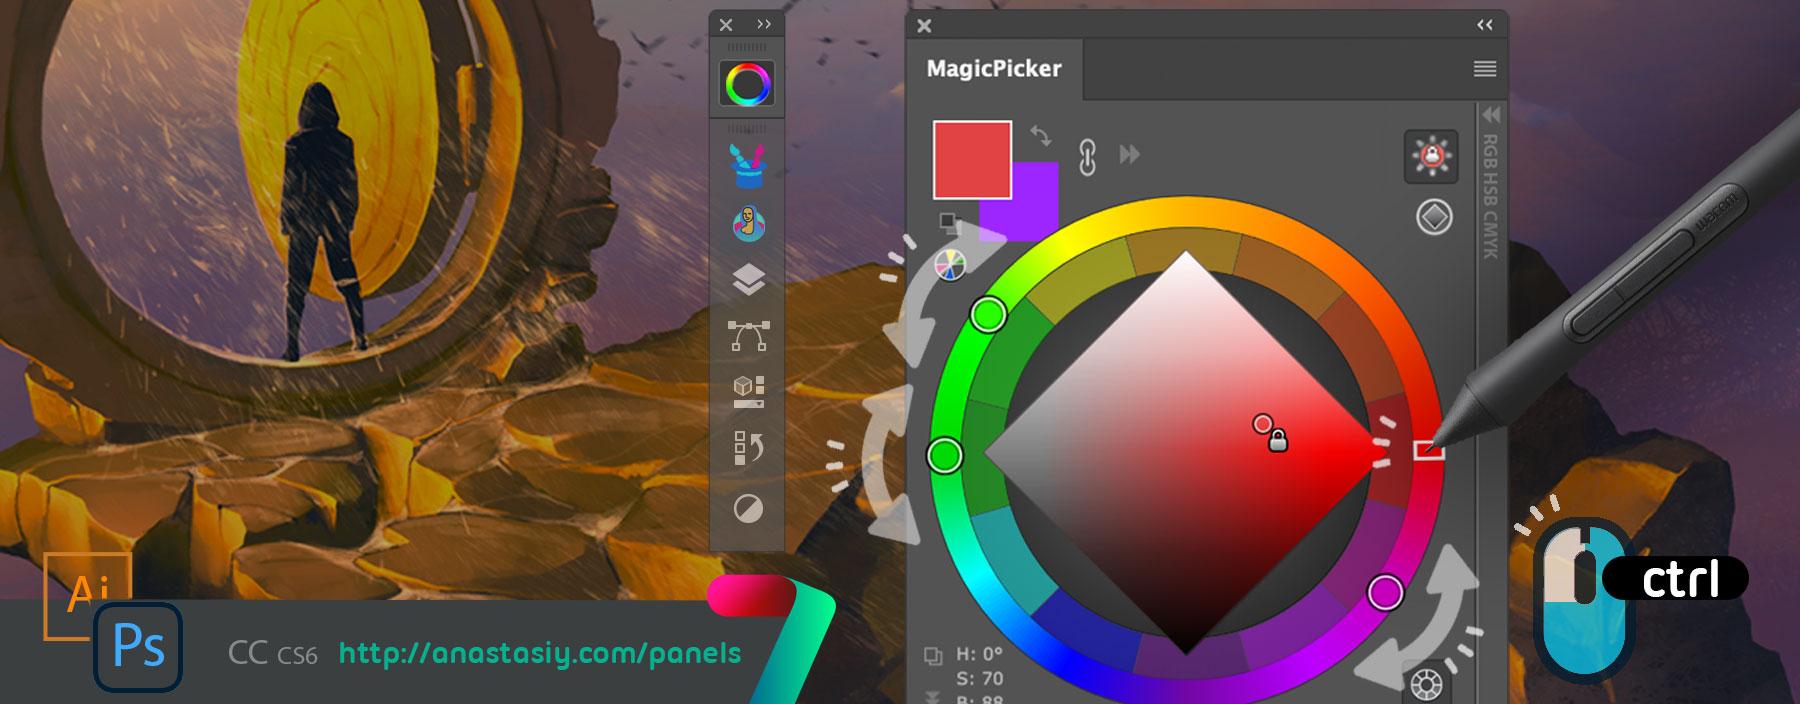 MagicPicker - adjust Color Schemes in Photoshop or Illustrator